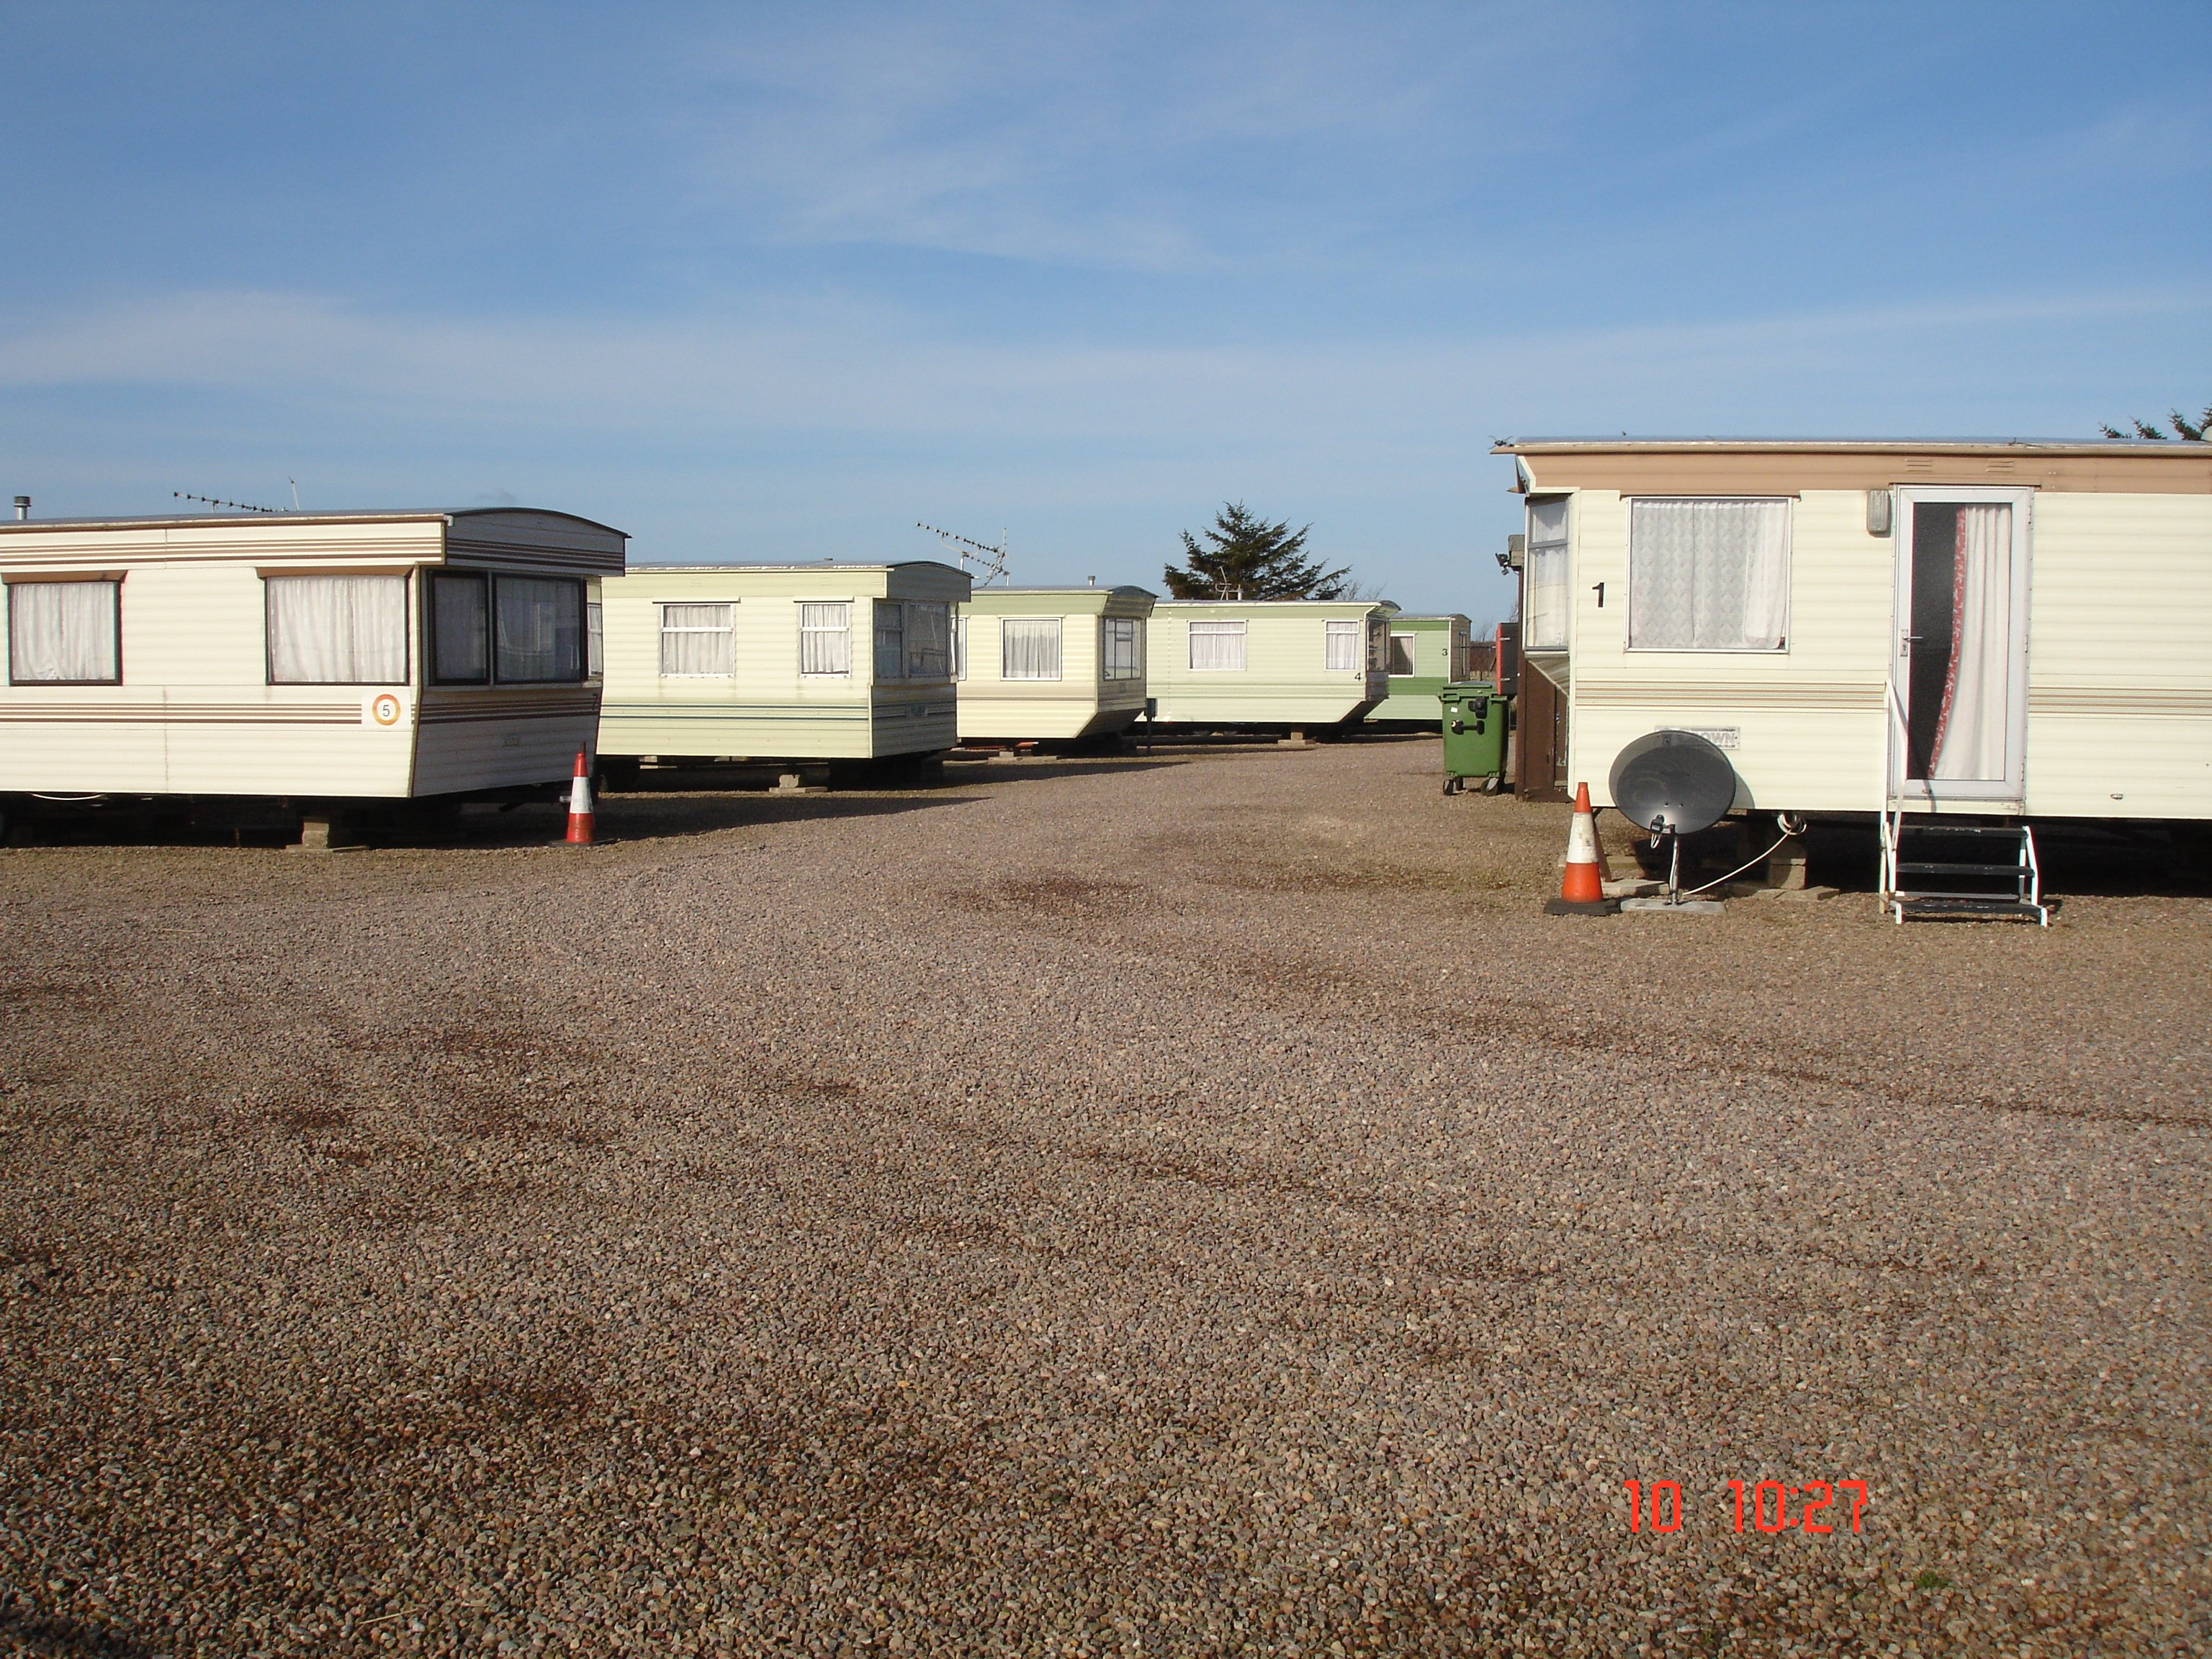 multiple carvans parked